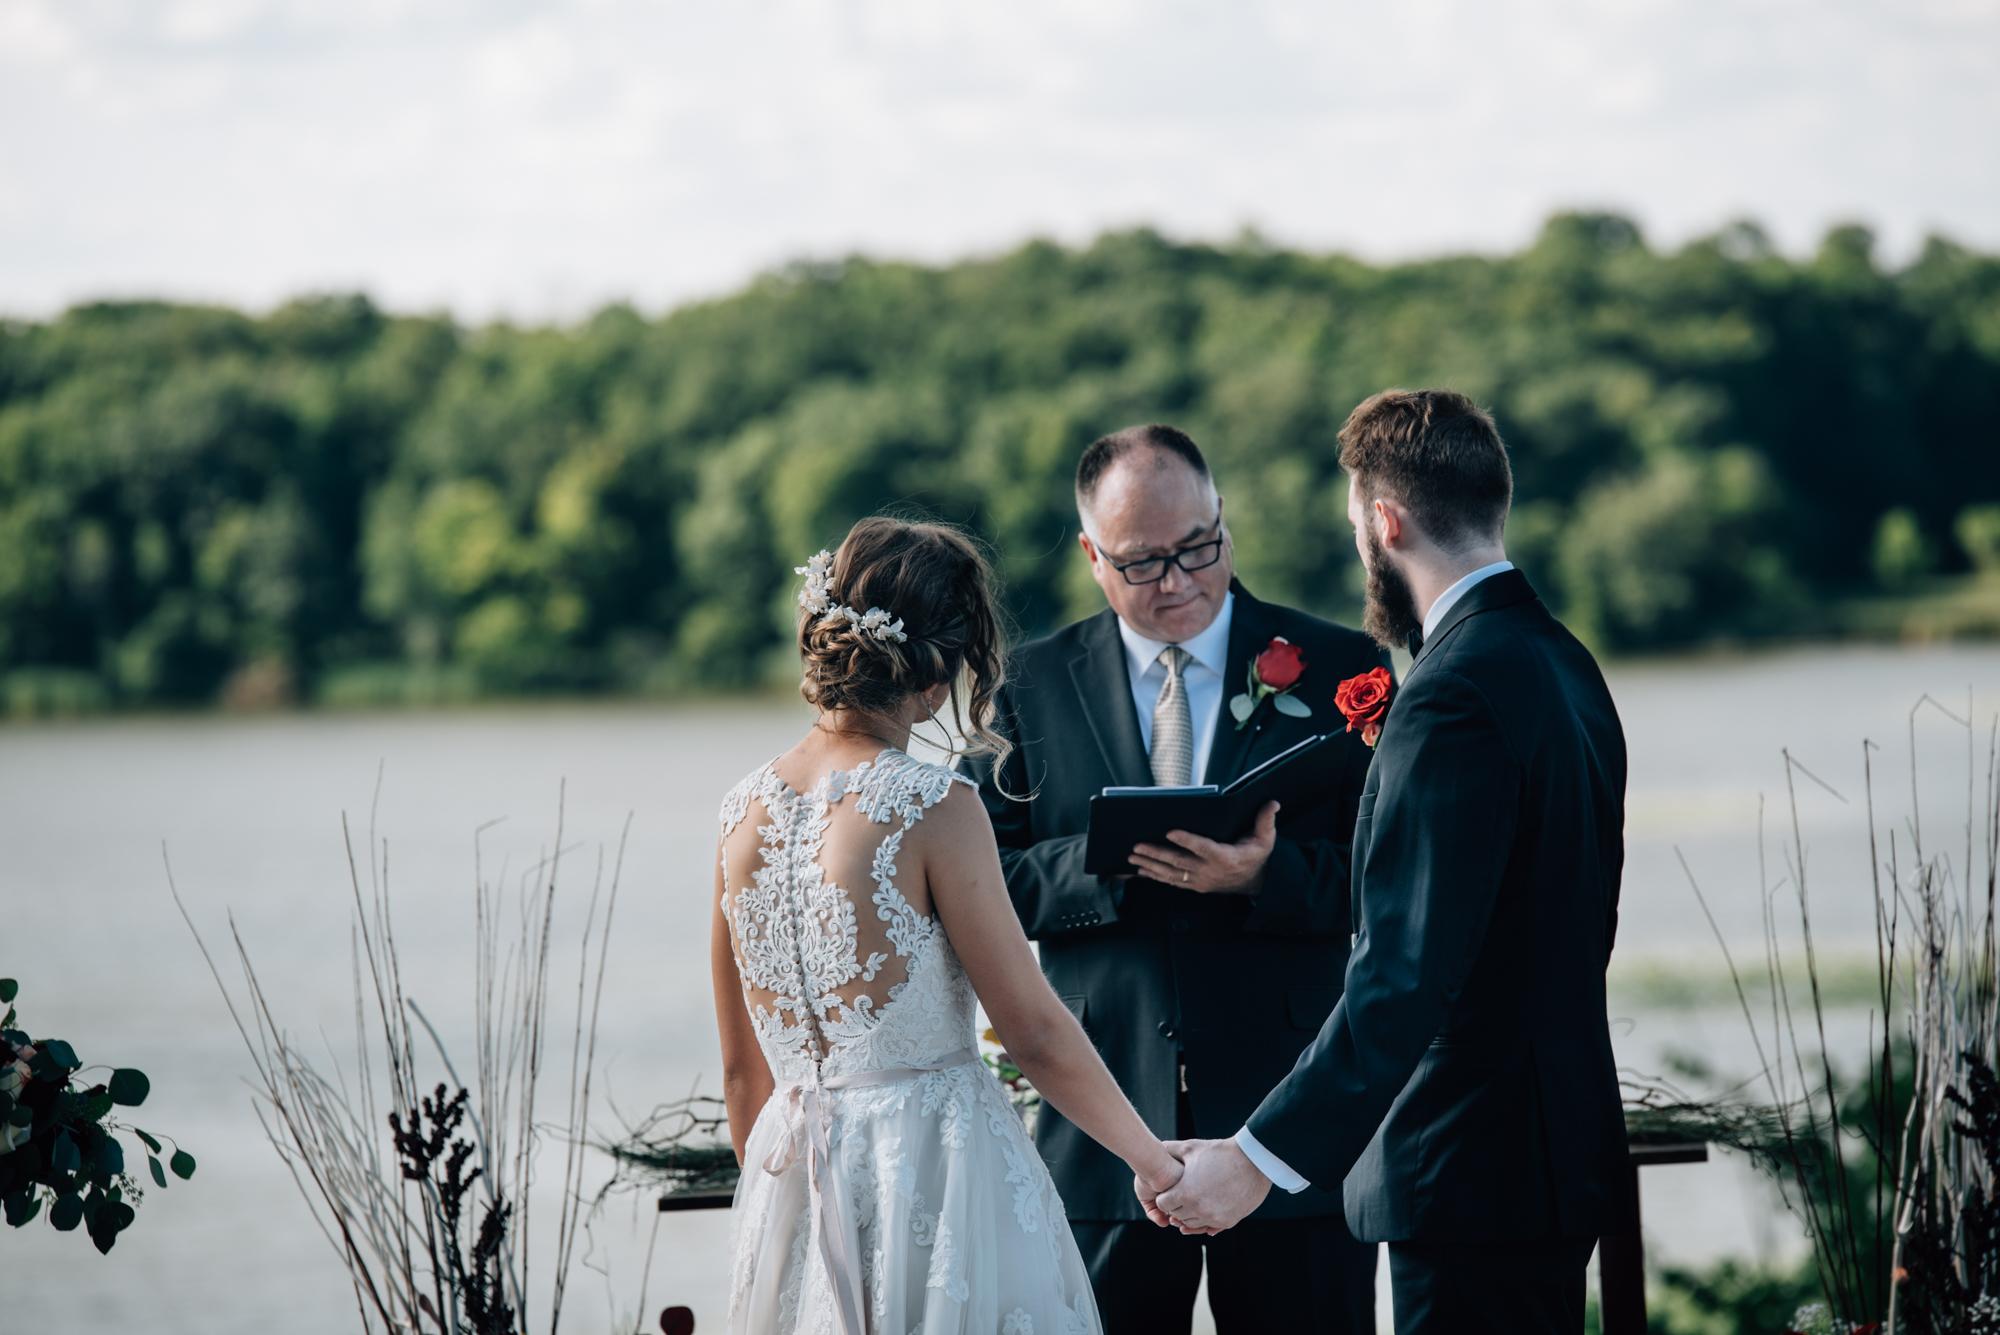 heartfelt-minnesota-wedding-photographer-1-5.jpg